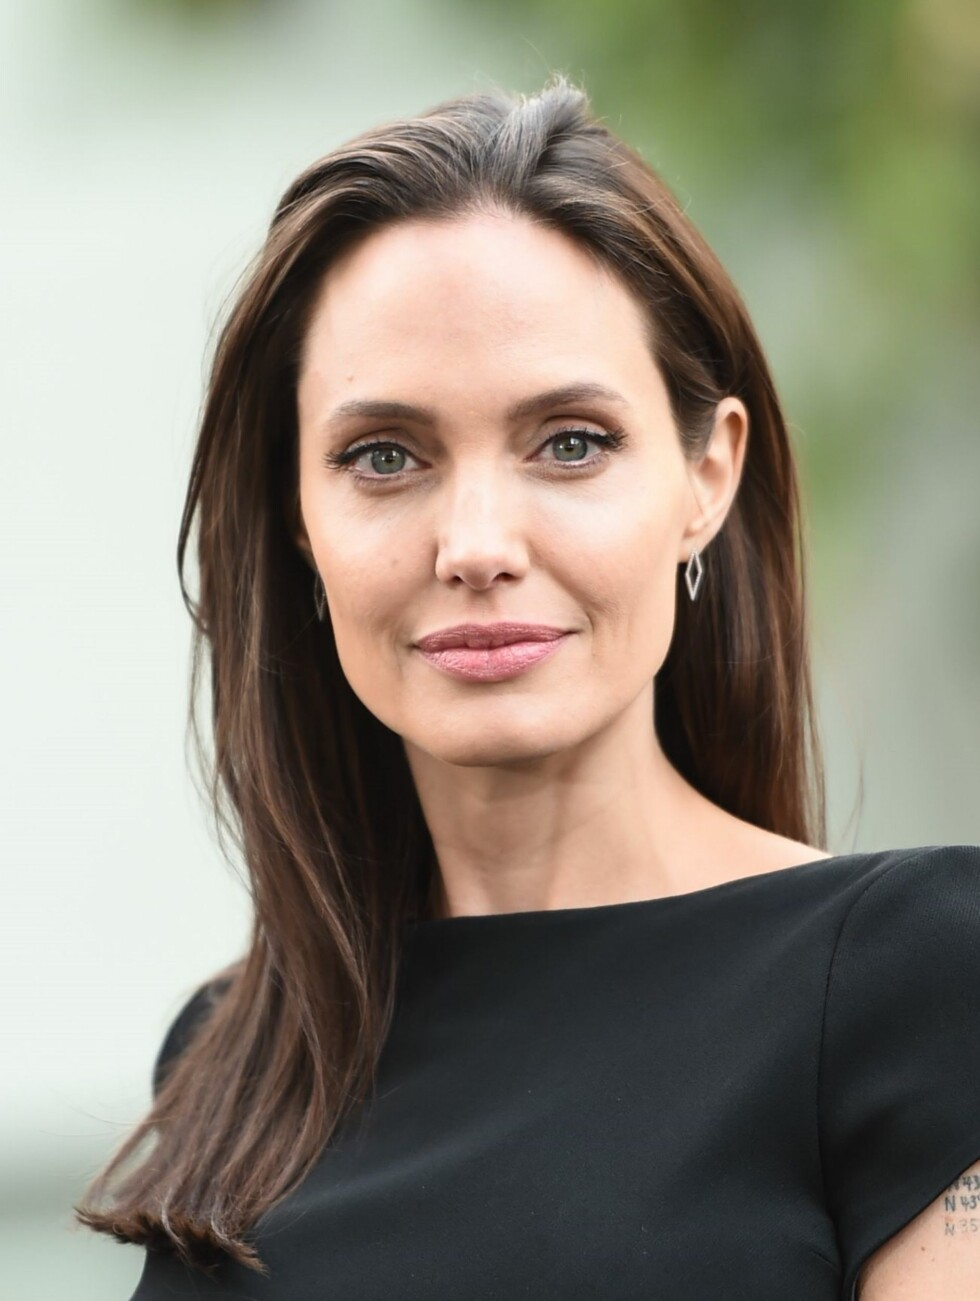 ANGELINA JOLIE: Disse fantastiske øynene passer perfekt til hårfargene Jolie har her. Foto: Rex Features